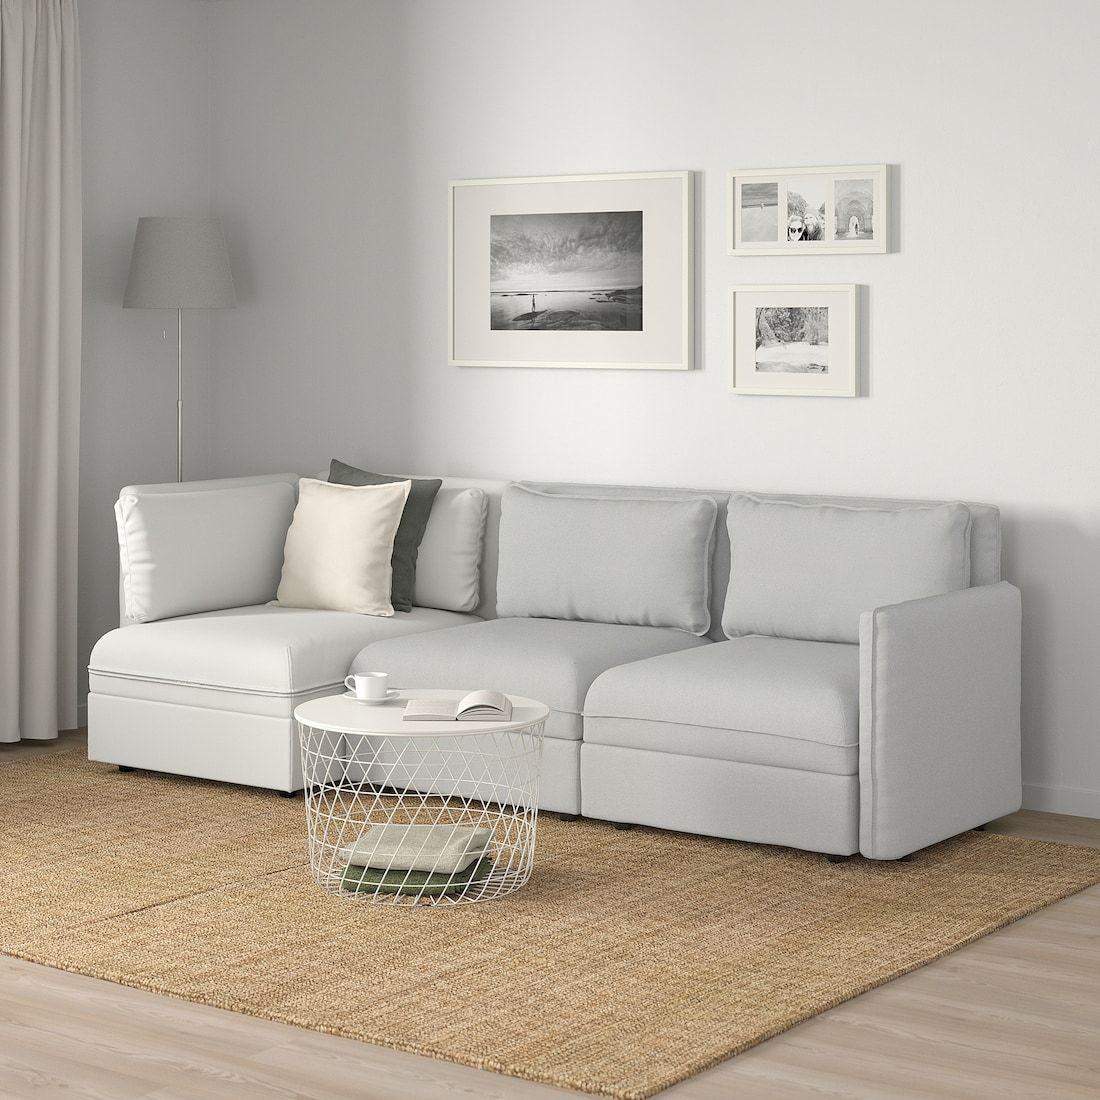 Vallentuna 3 Seat Modular Sleeper Sofa And Storage Orrsta Murum Light Gray White Ikea In 2020 Vallentuna Sofa Pillow Sets Modular Sofa